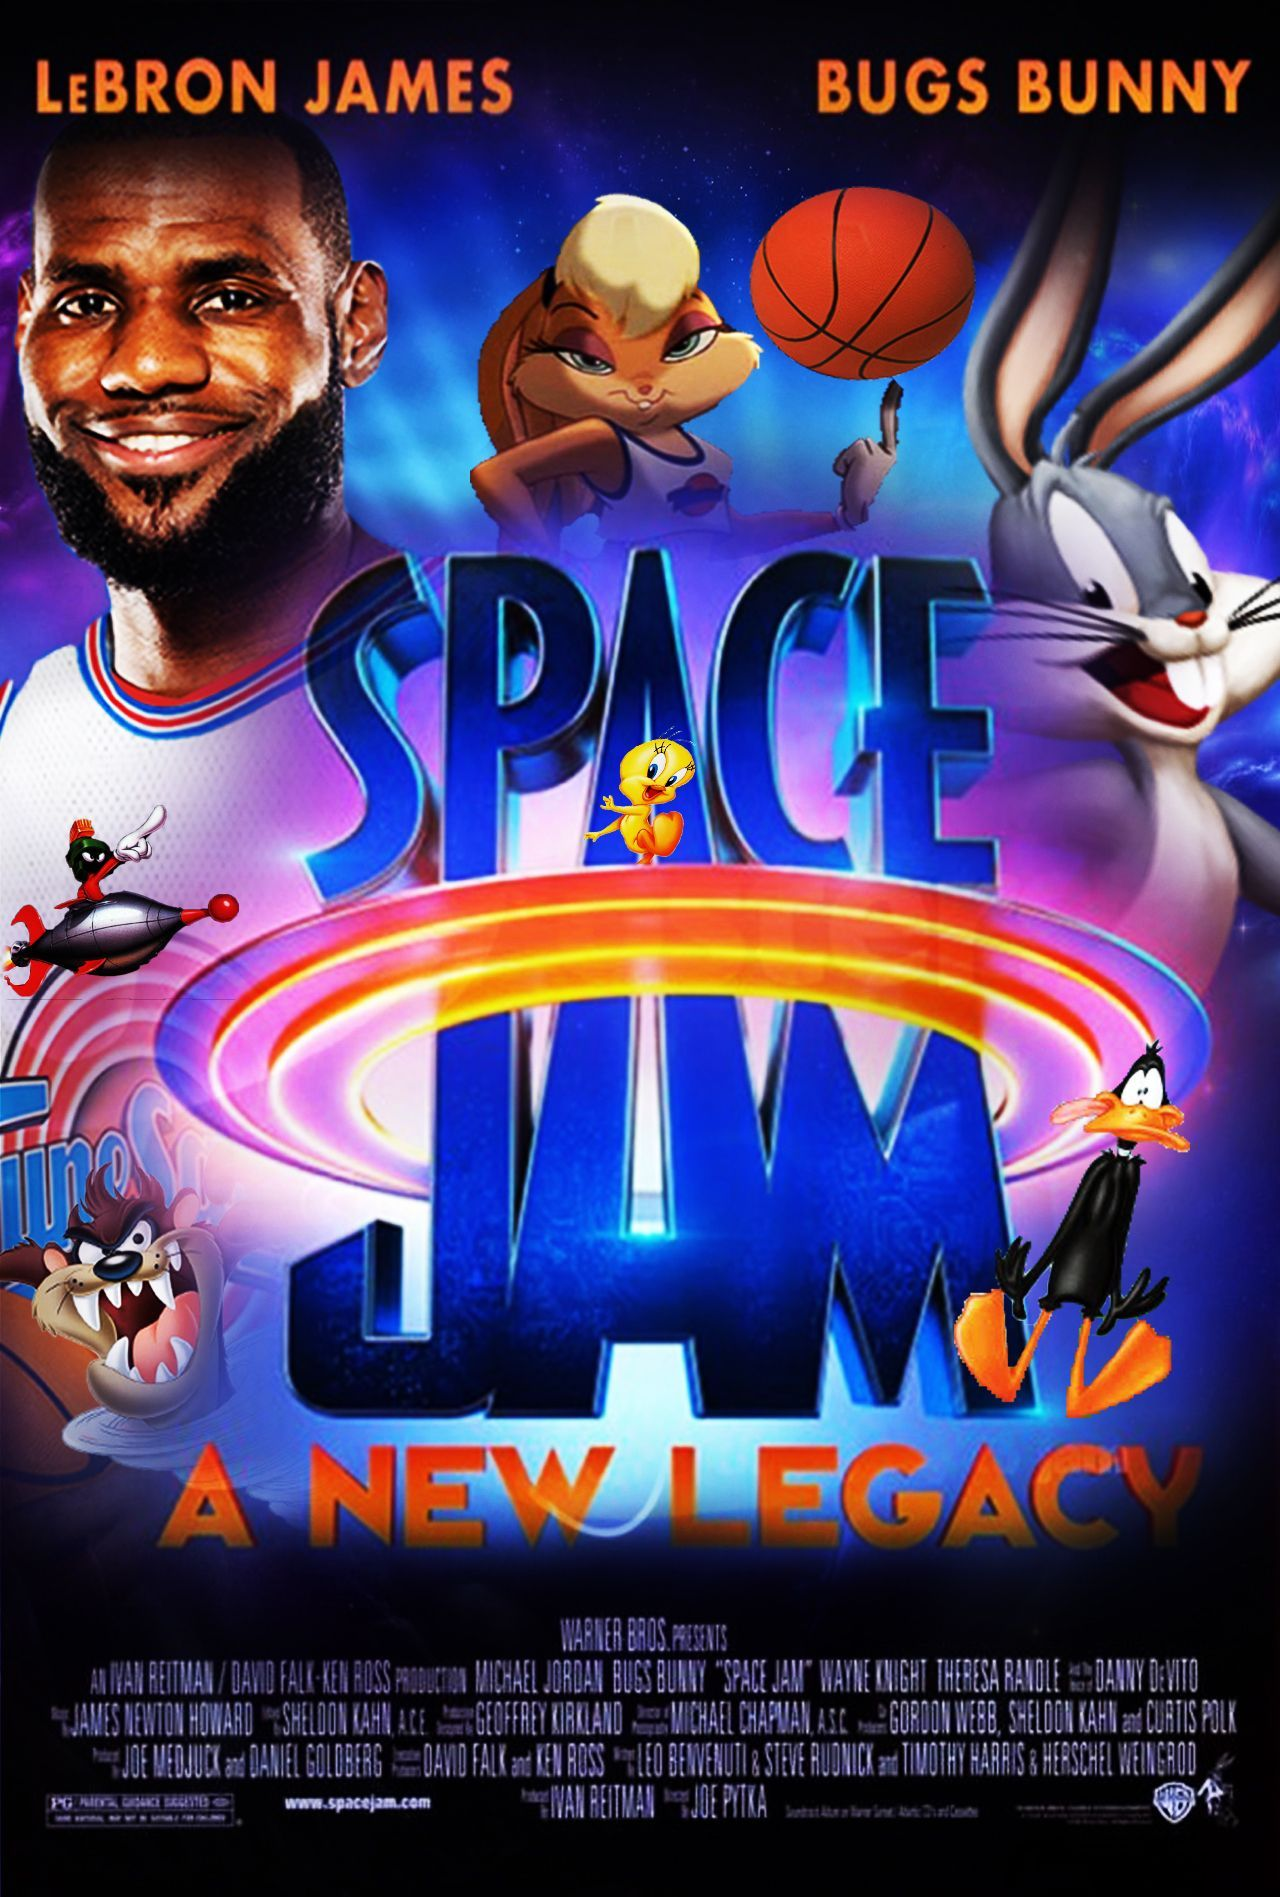 Space Jam: A New Legacy (2021) Hindi (HQ Fan Dub) + English [Dual Audio] | WEBRip 720p [MelBET]